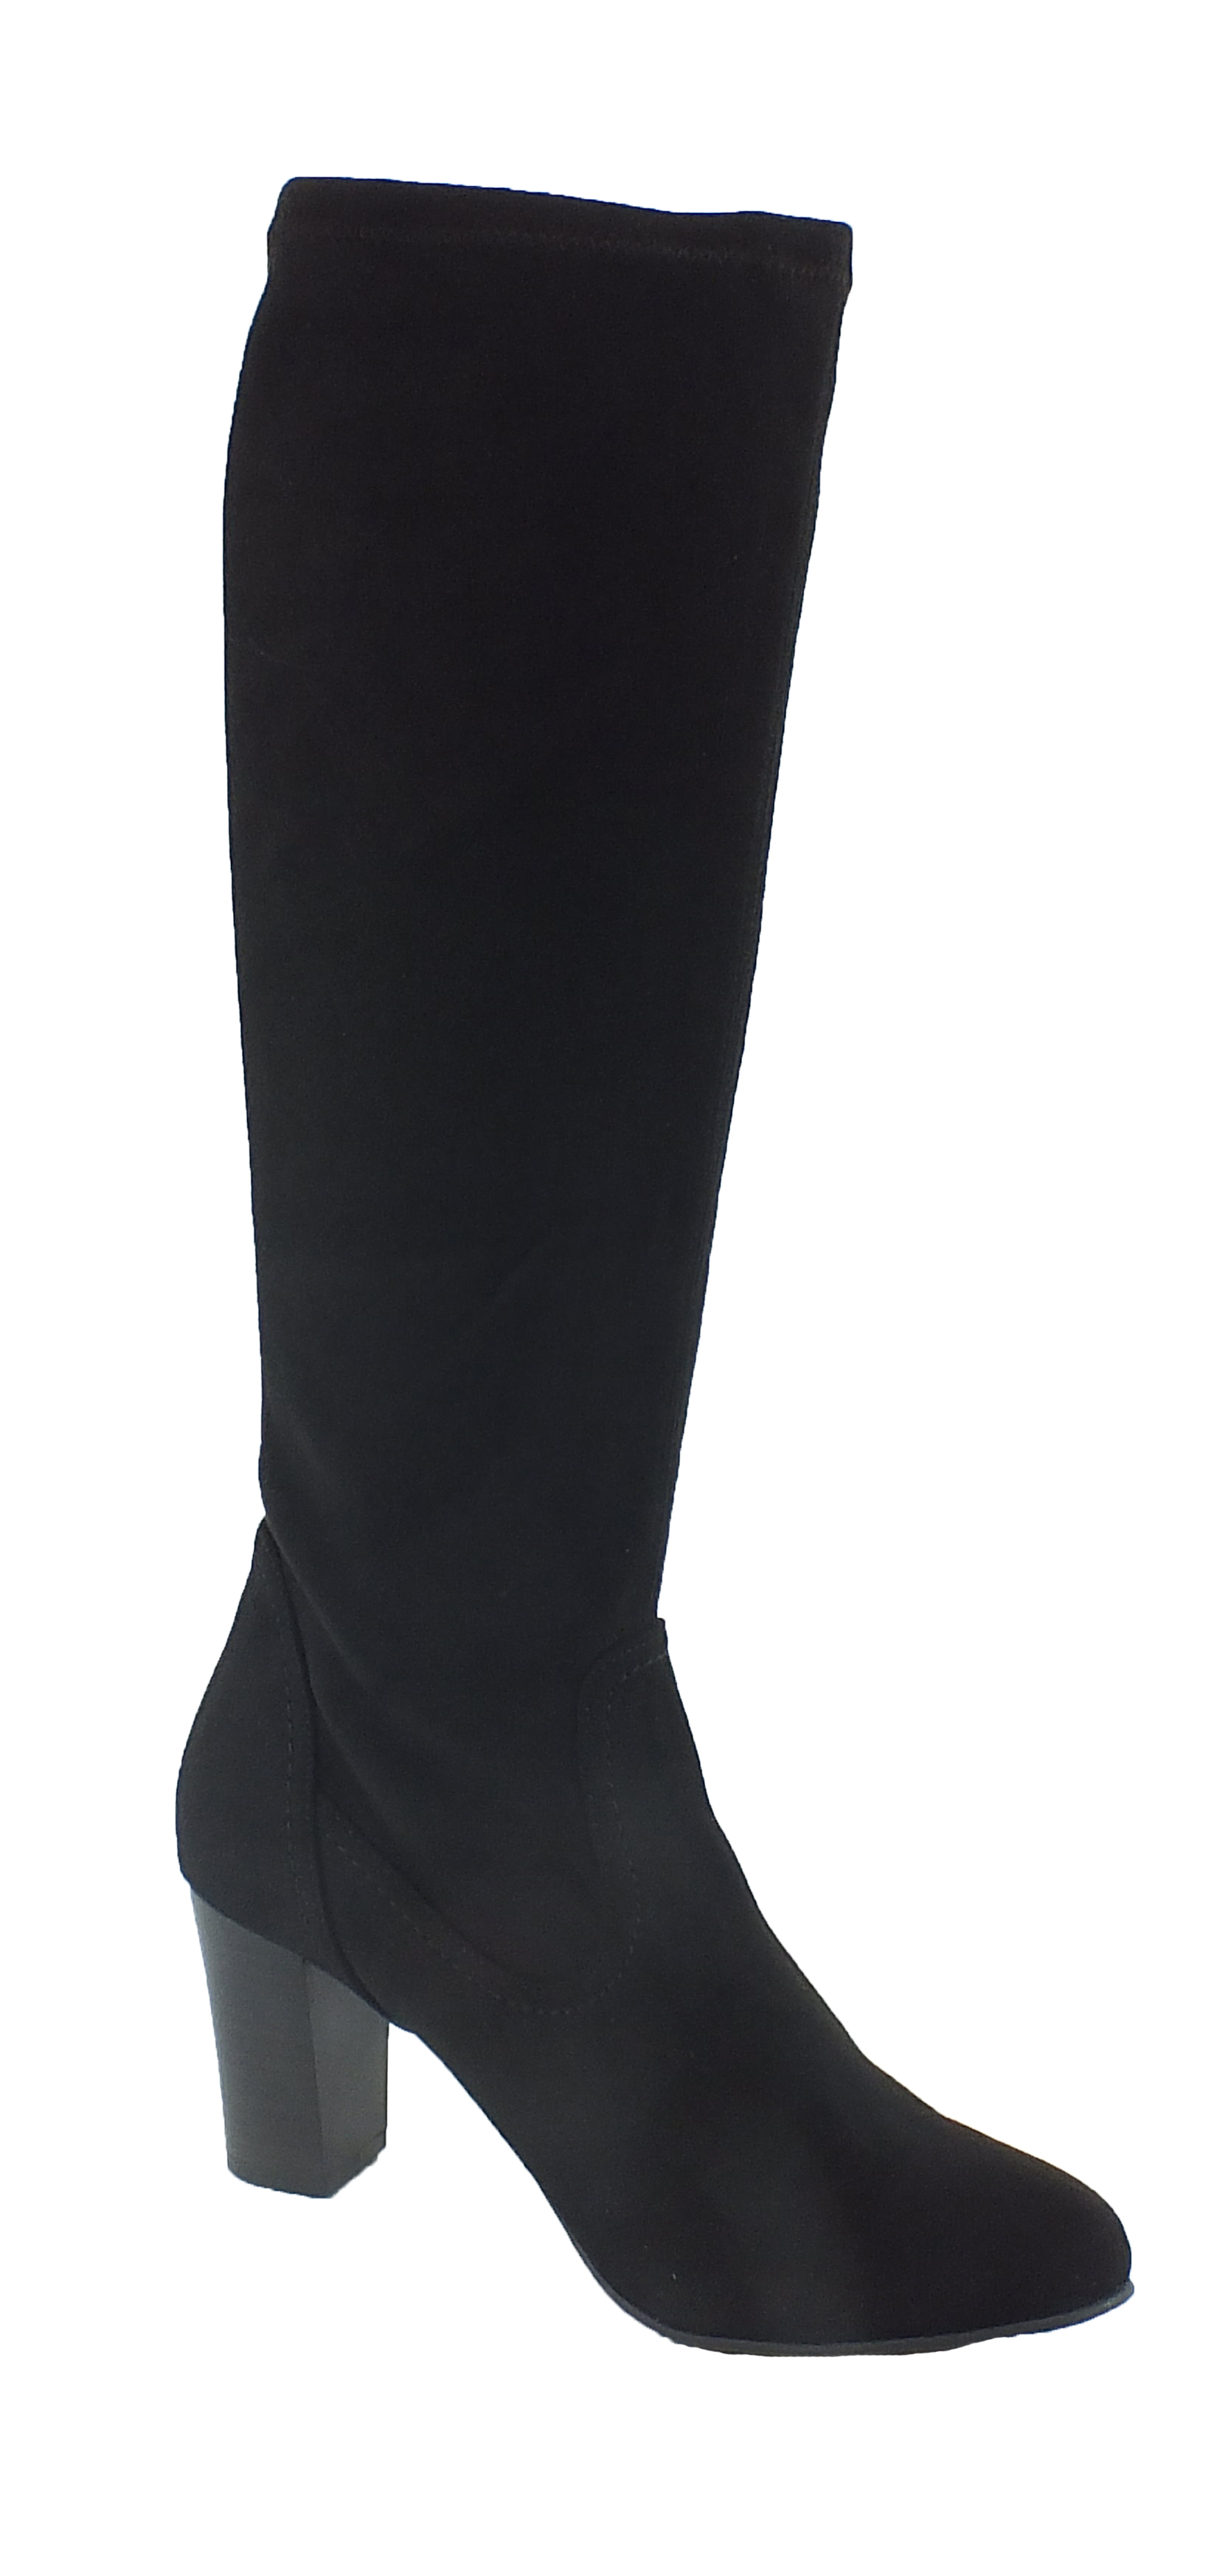 caprice stretch stiefel boots schwarz dehnbar 7427 ebay. Black Bedroom Furniture Sets. Home Design Ideas